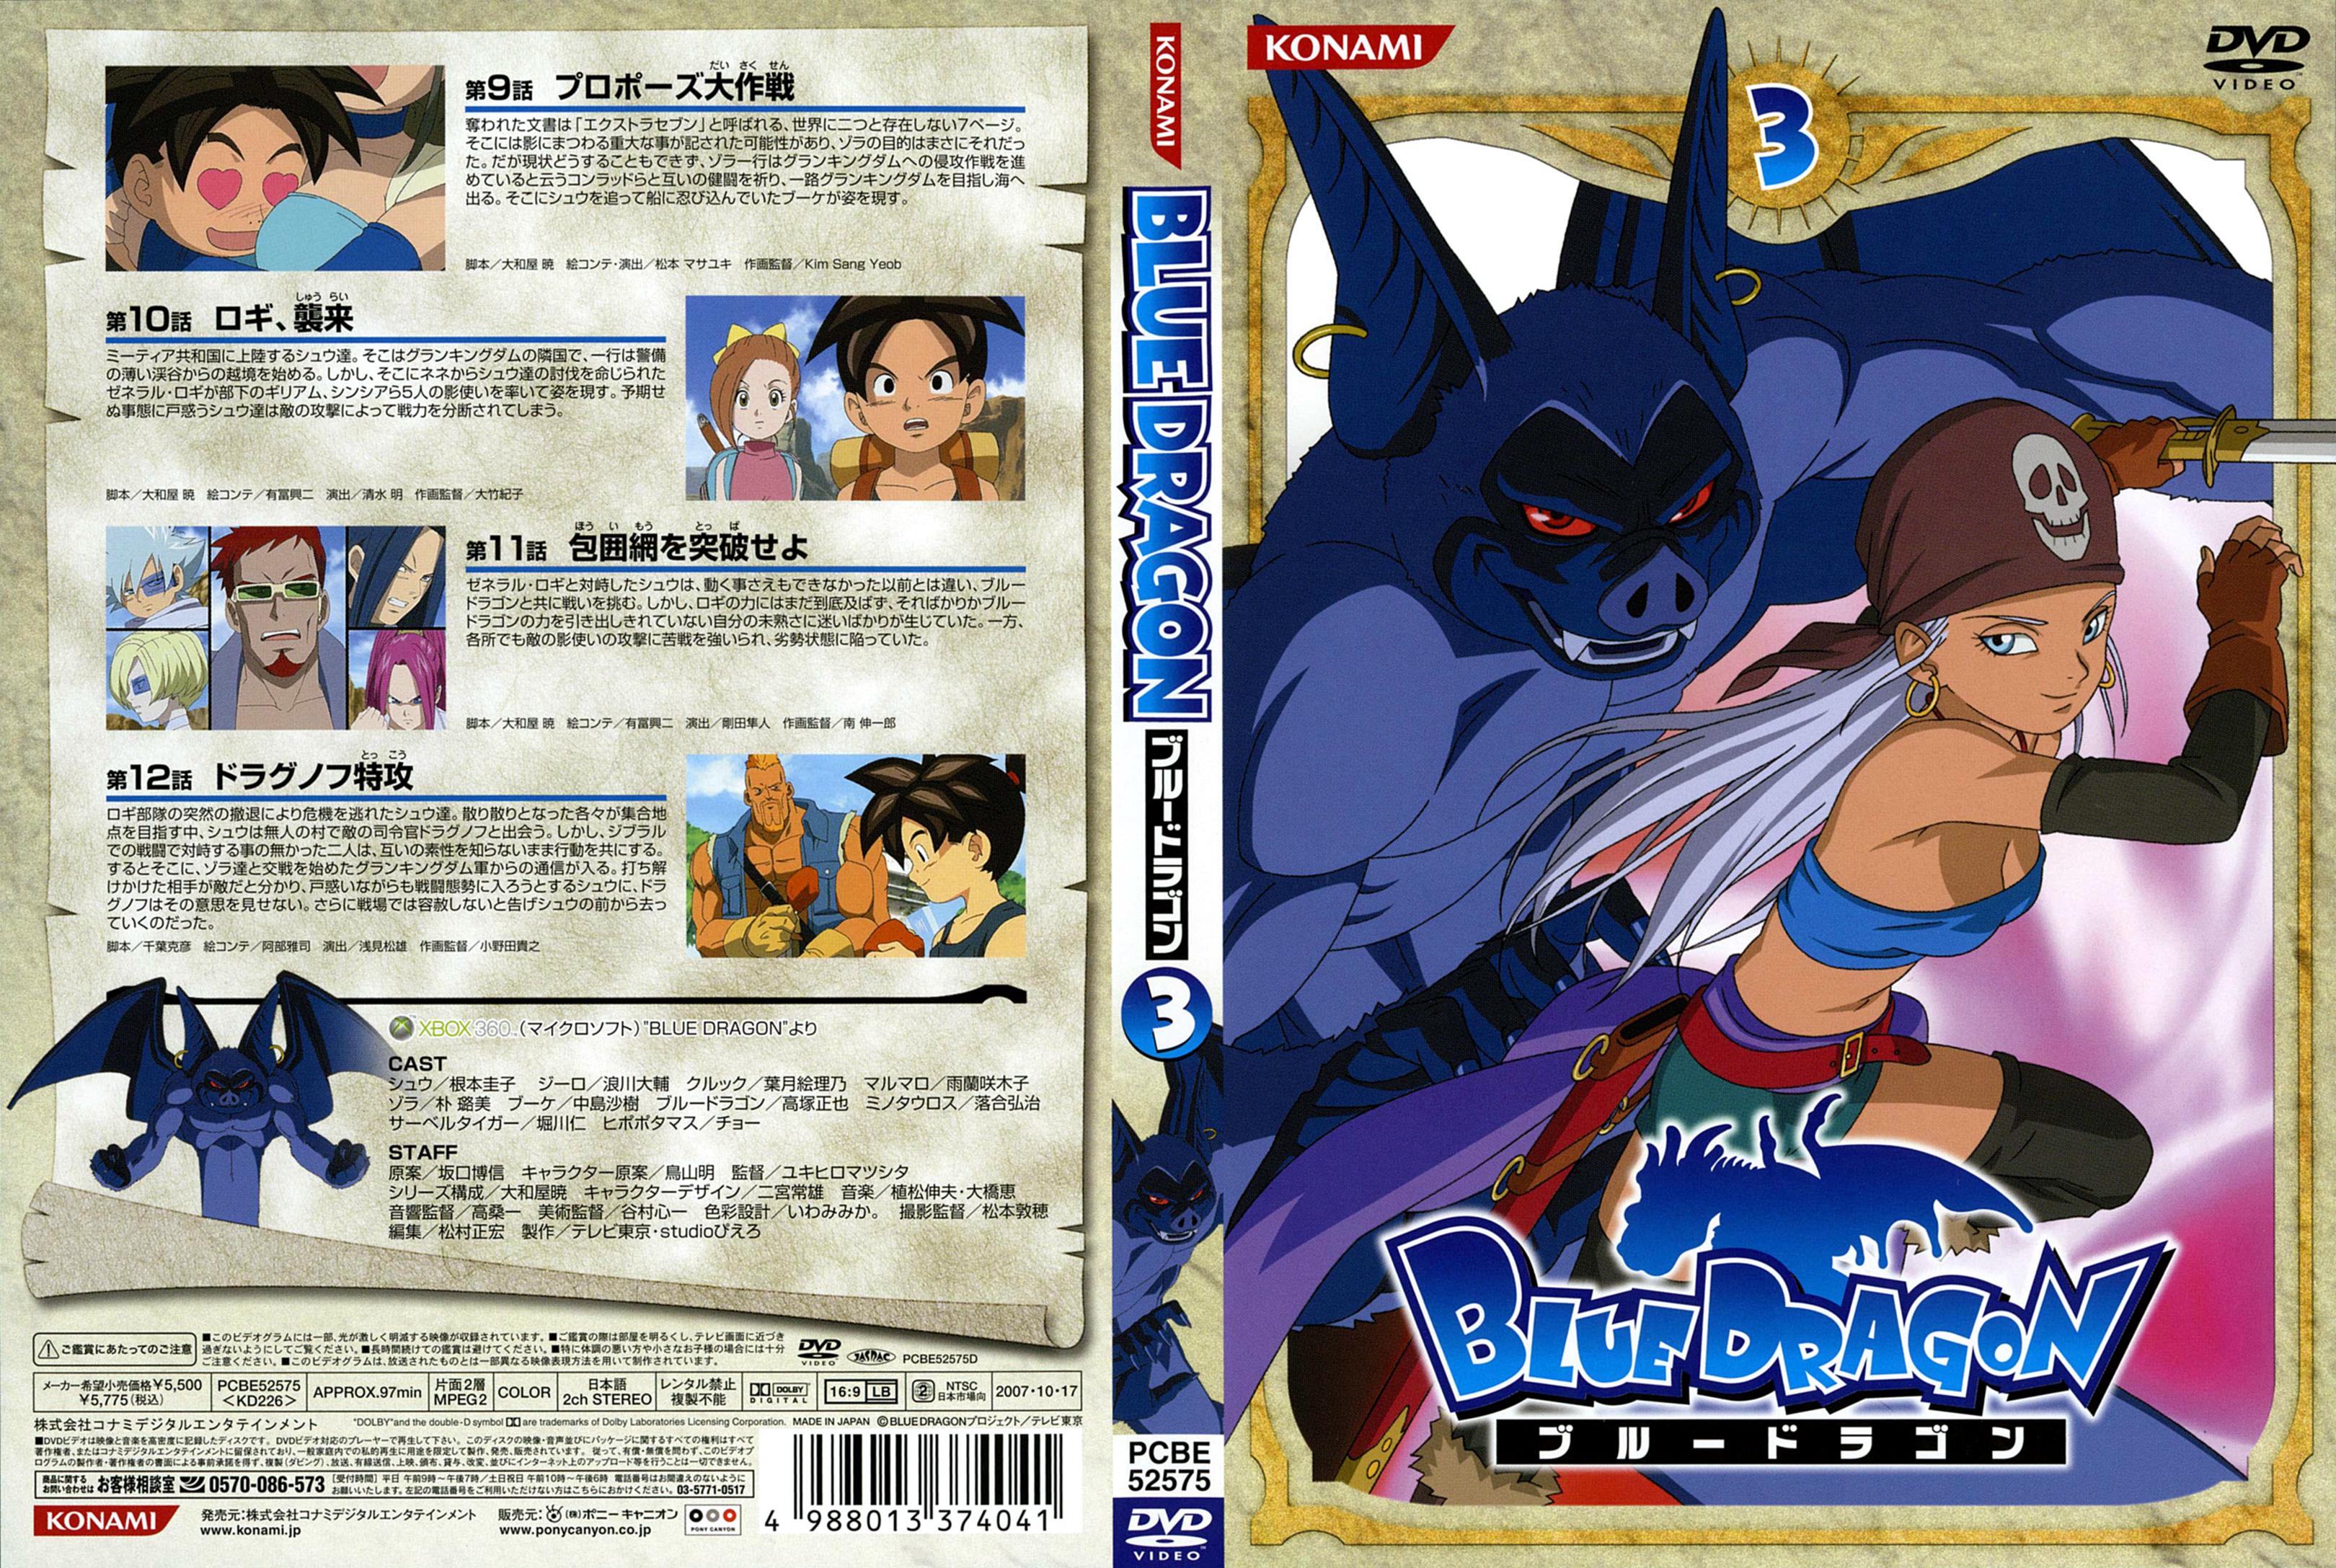 Blue dragon zola porn sexy pic